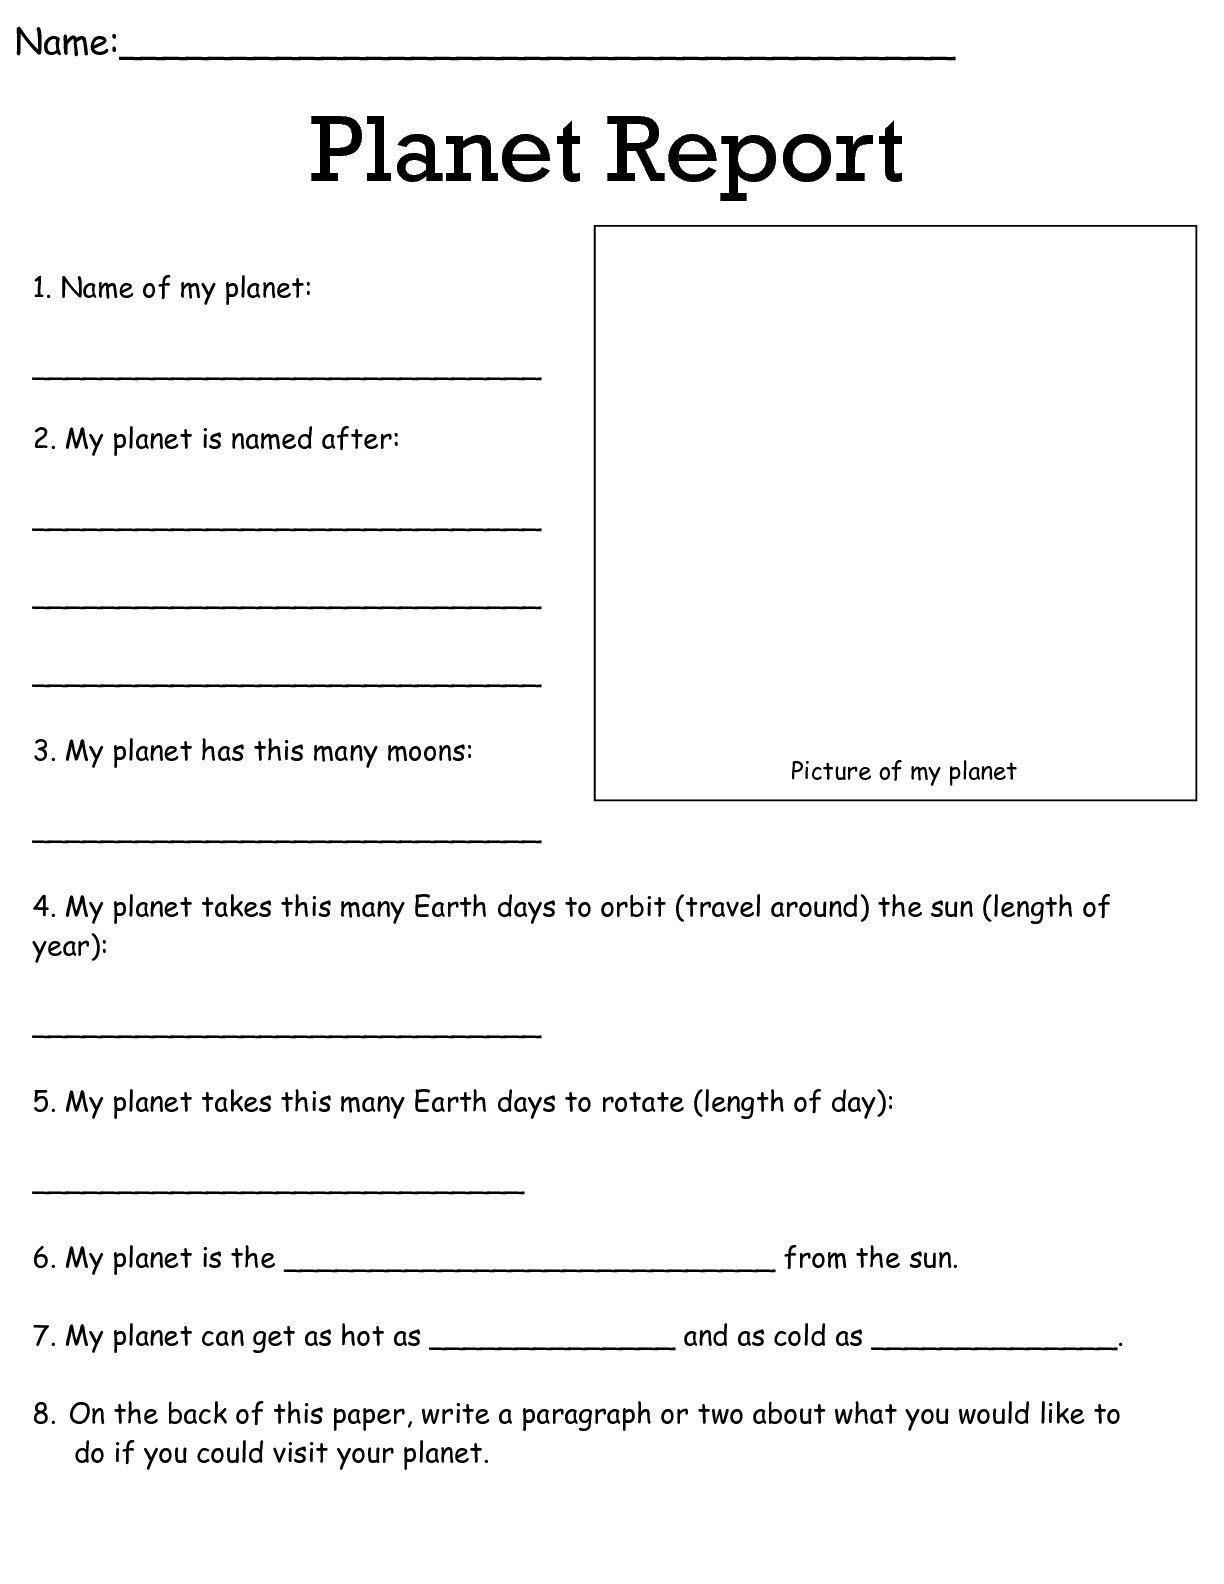 Job Worksheets 5Th &6Th | Science Worksheets Science Worksheets | Grade 3 Social Studies Worksheets Printable